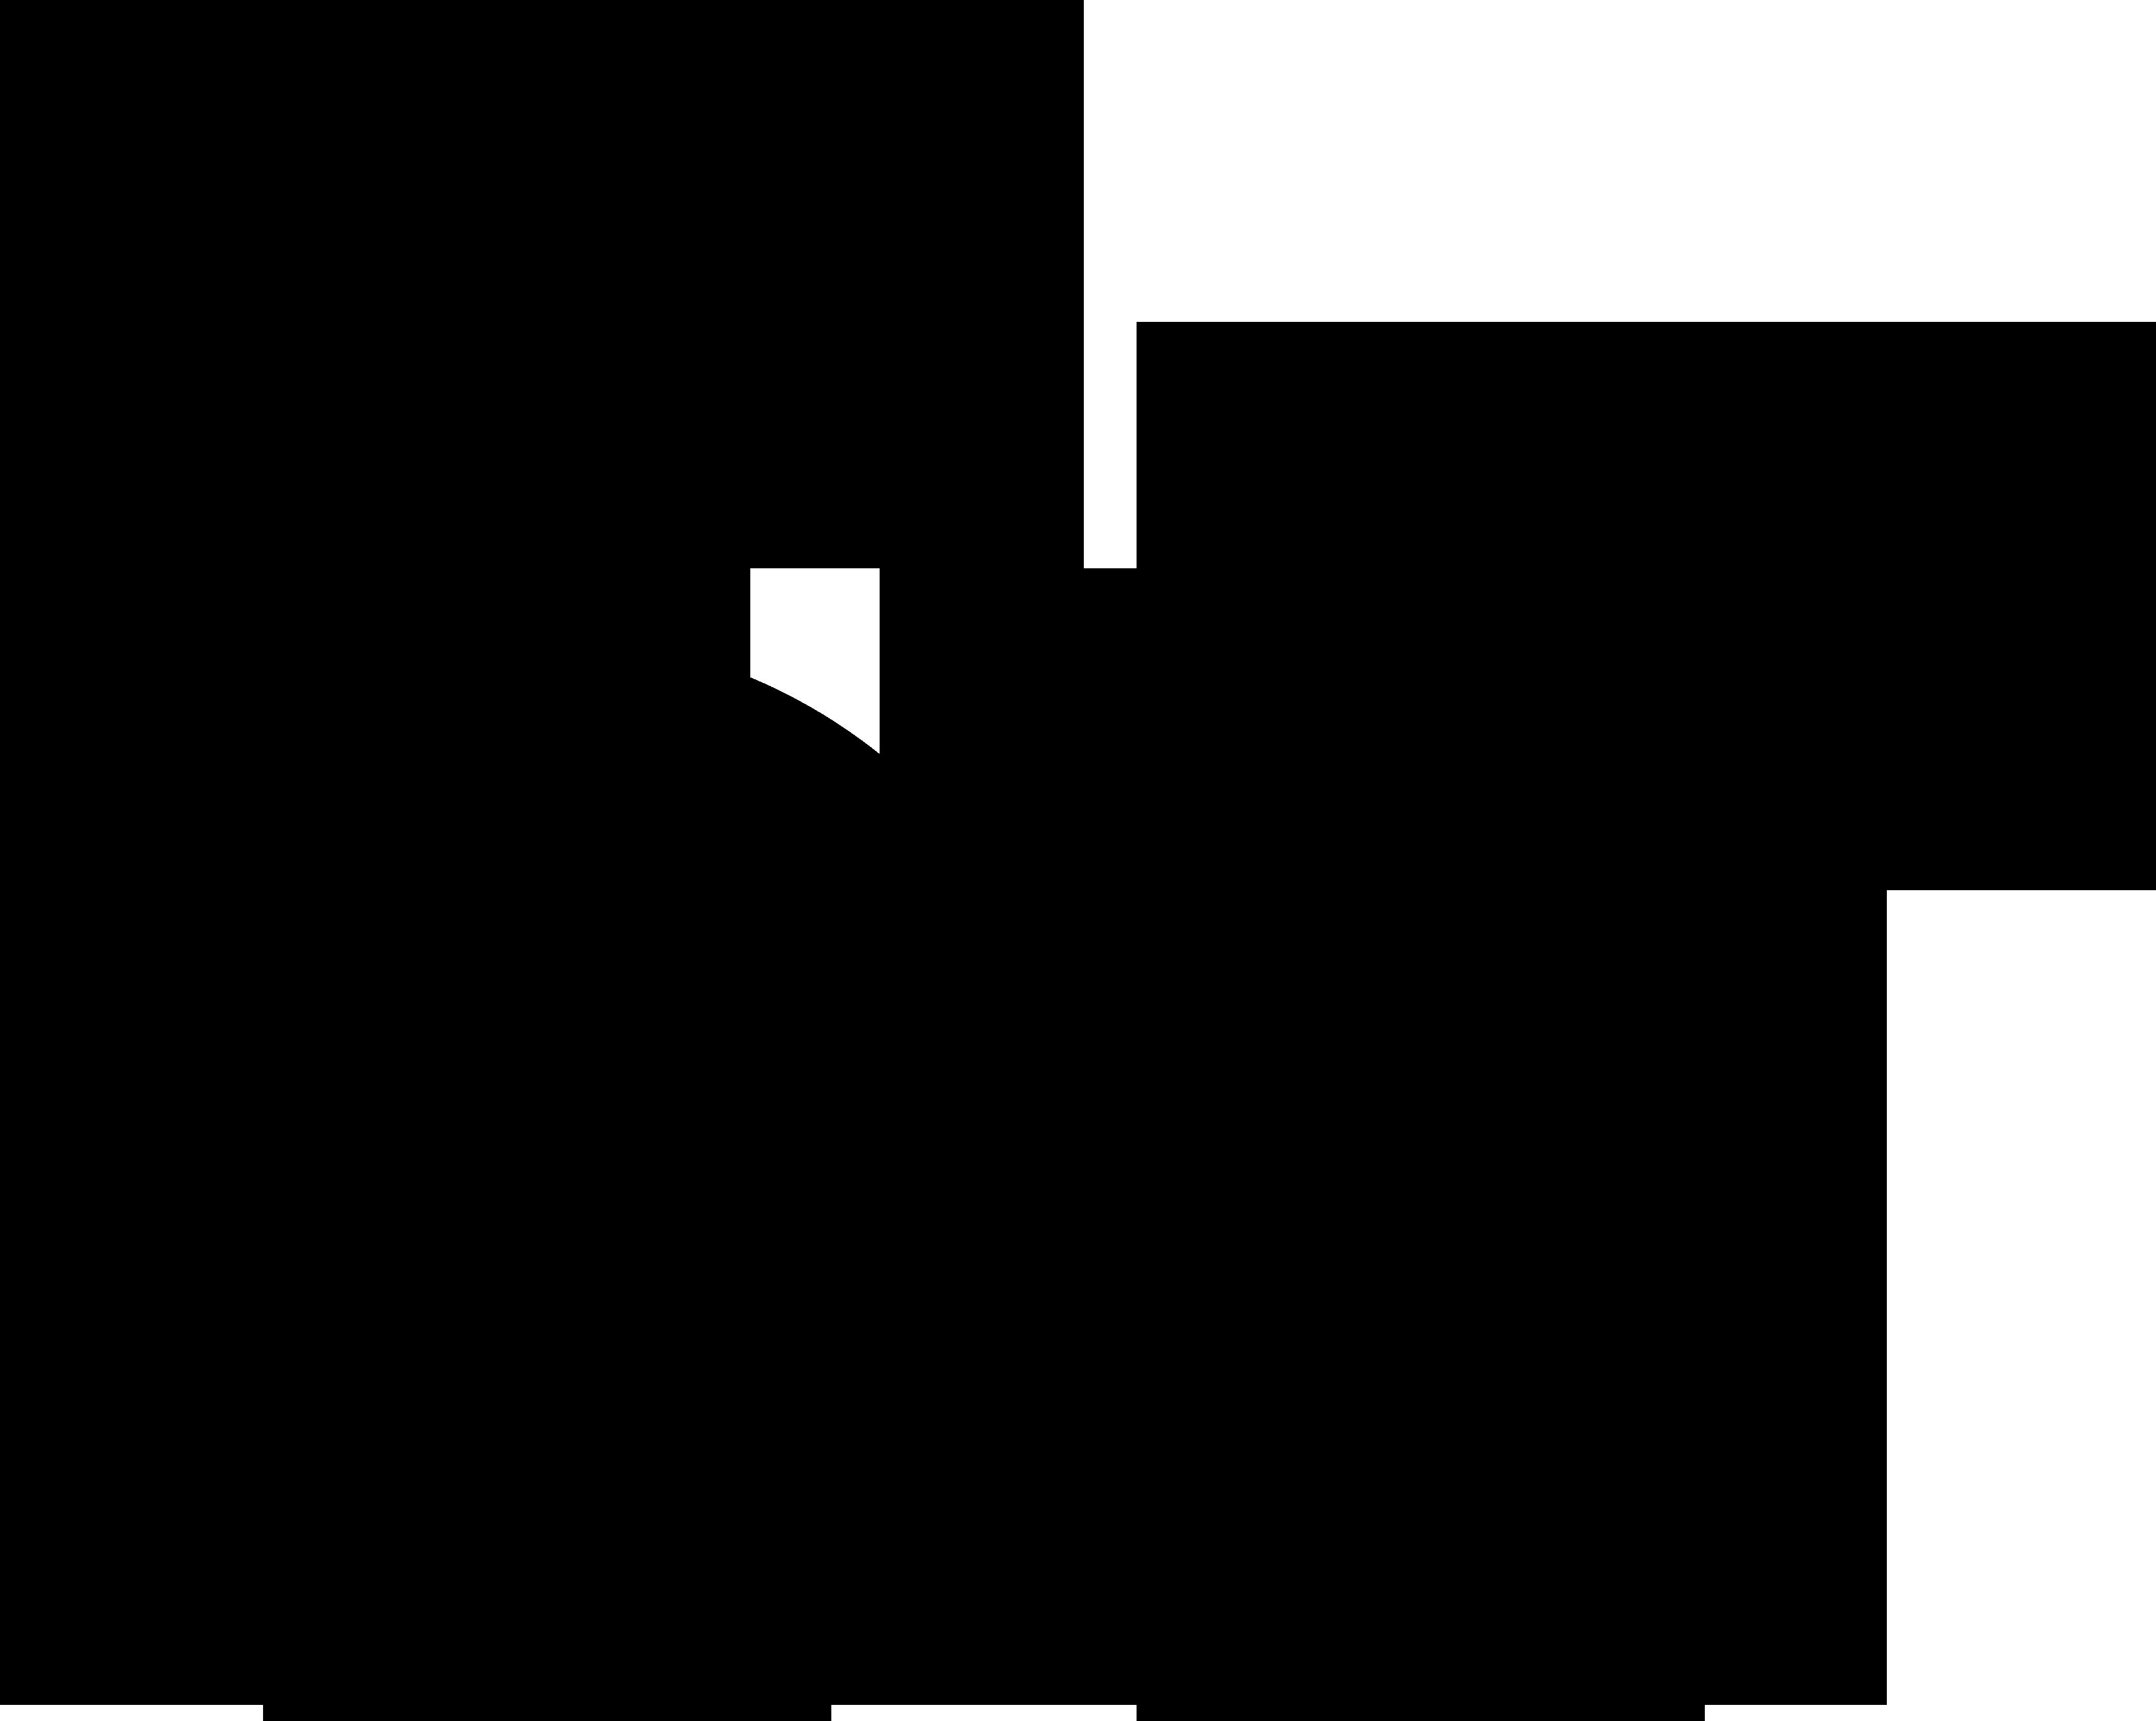 Nonbinary symbol interlocked with a nonbinary man symbol.